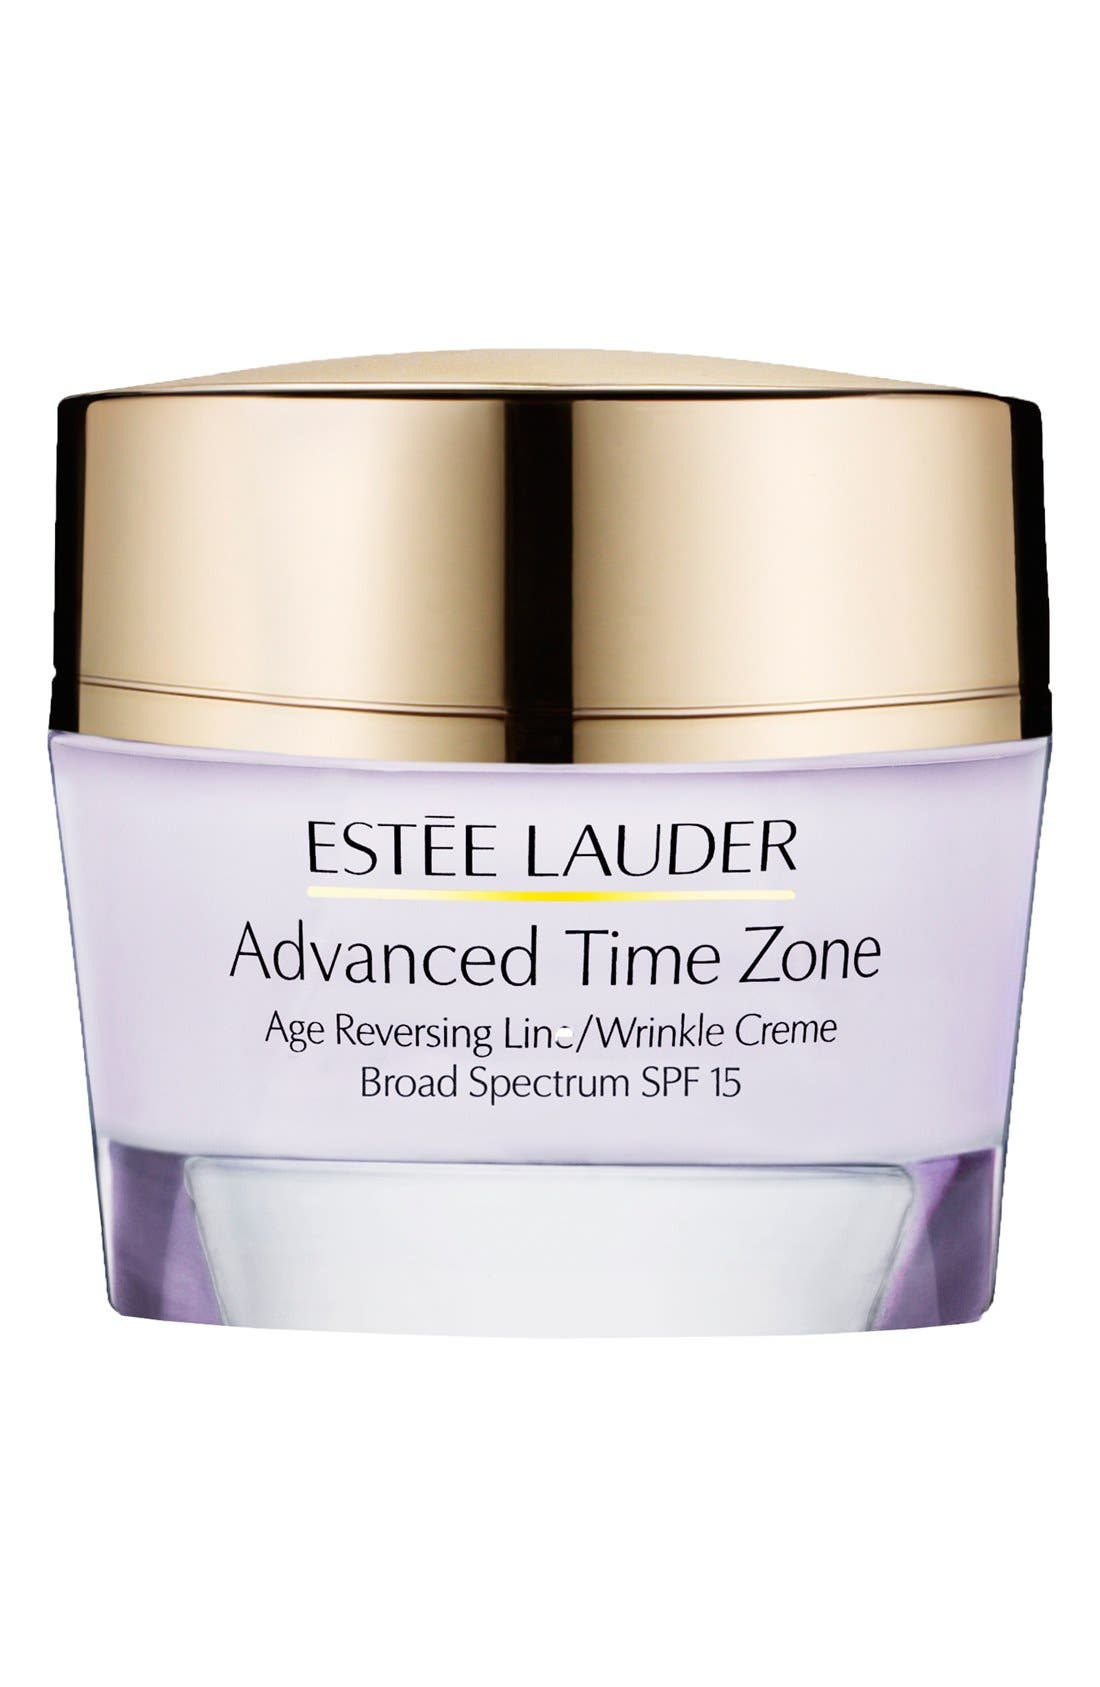 Estée Lauder Advanced Time Zone Age Reversing Line/Wrinkle Creme Broad Spectrum SPF 15